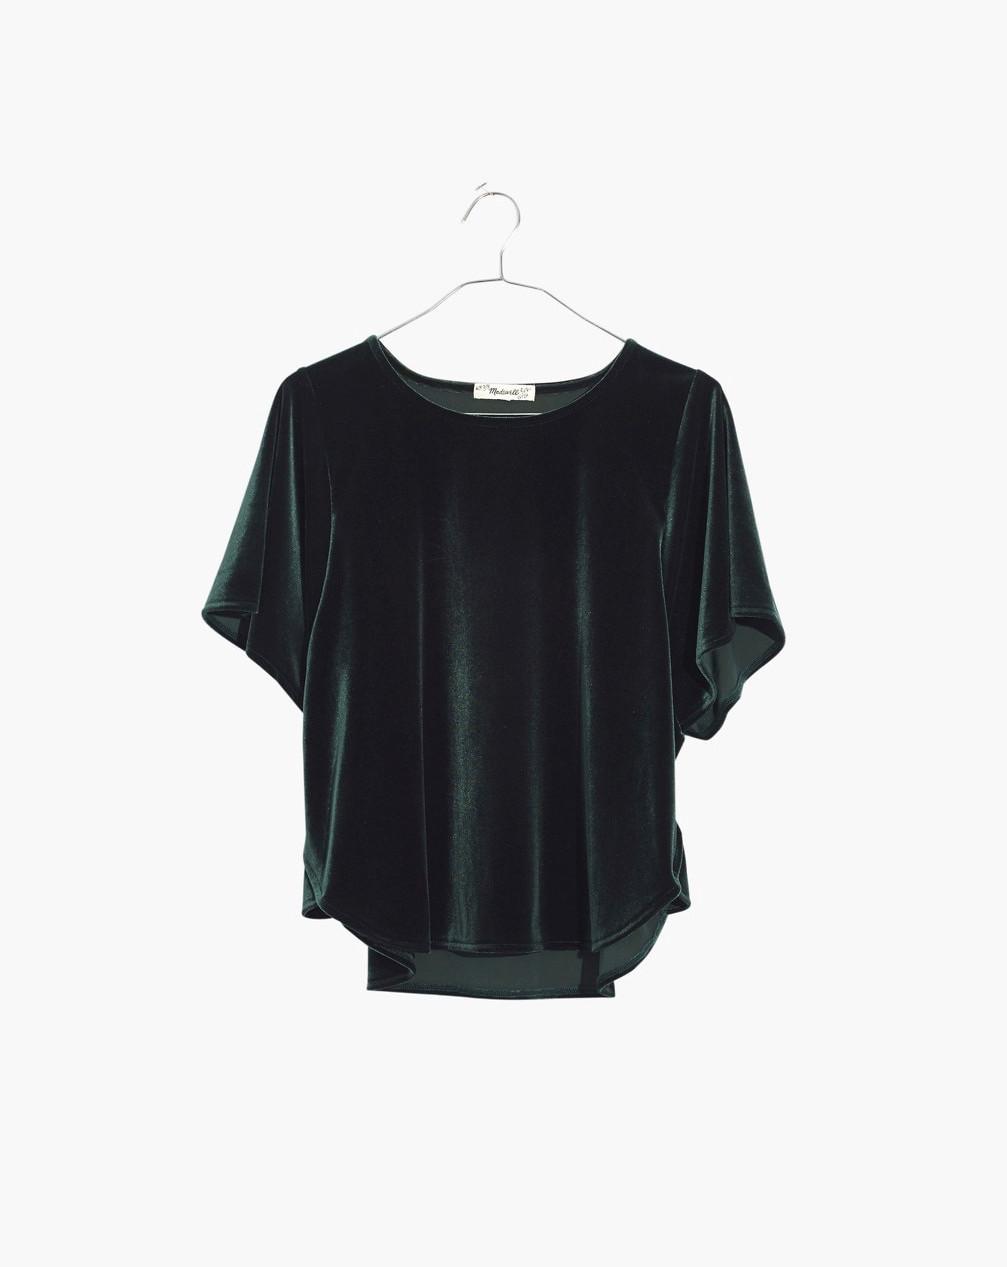 Green Madewell top